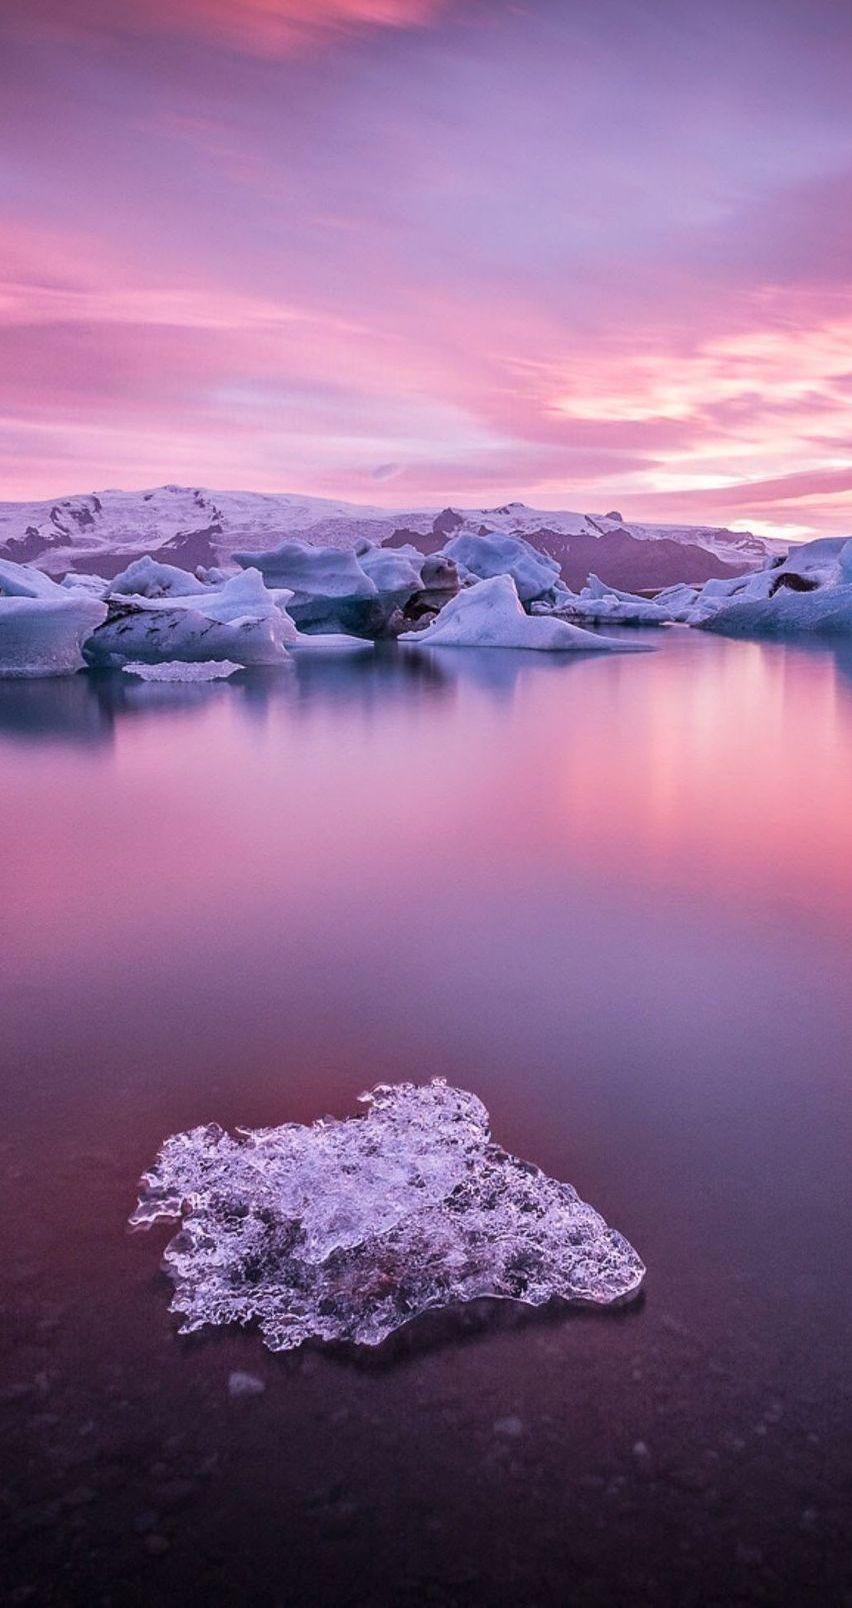 Lake scenery. 9 Amazing and beautiful Snowy and Ice Lake